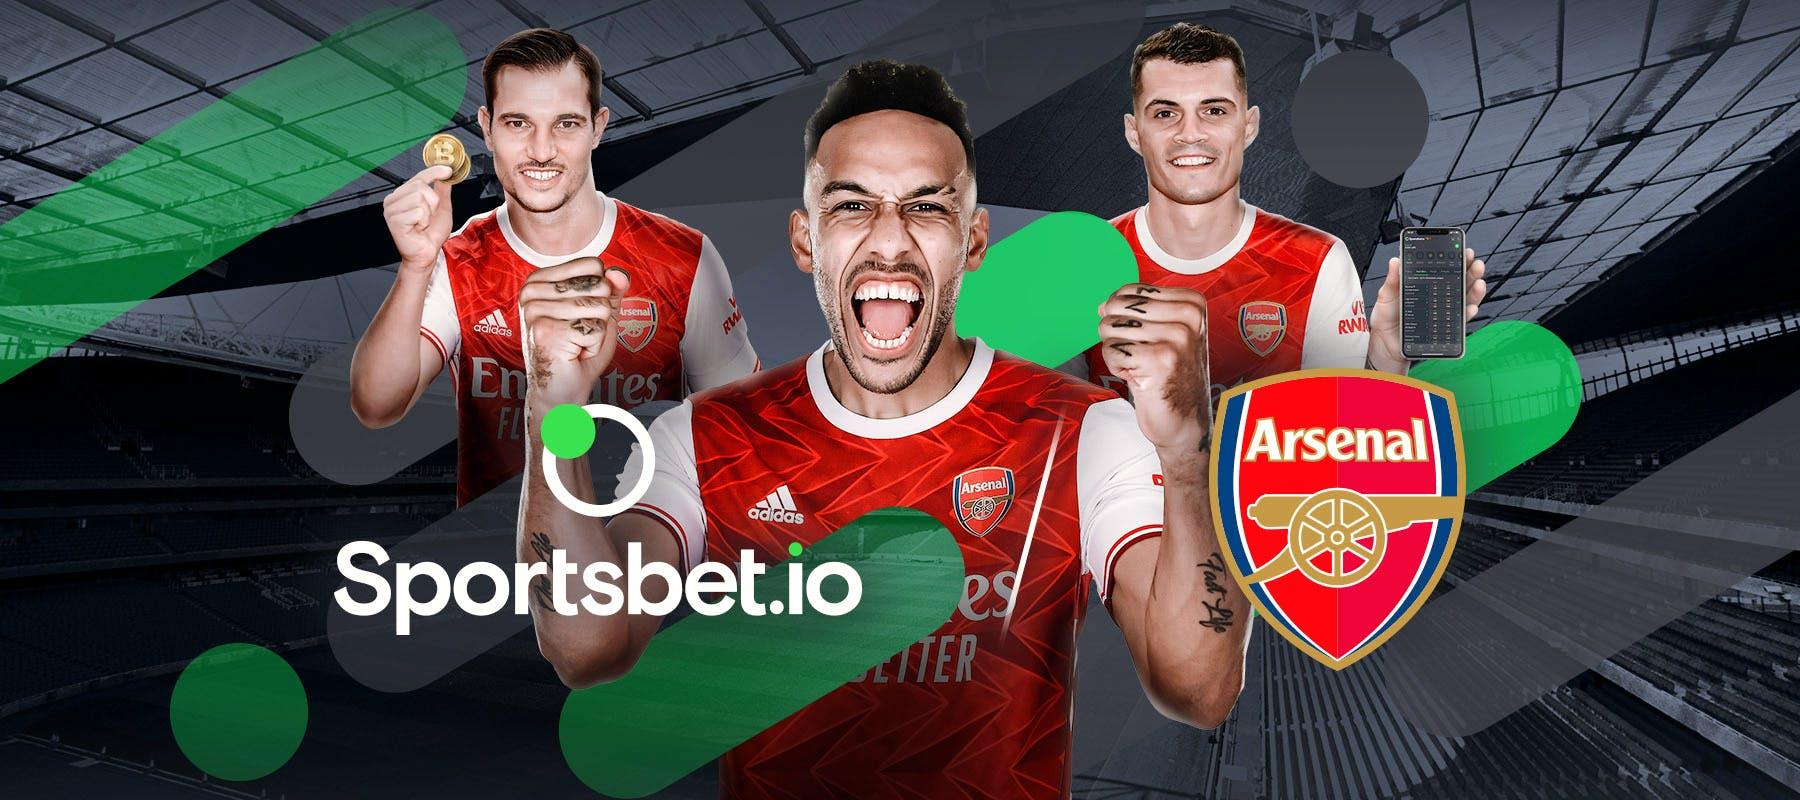 Sportsbet-Arsenal